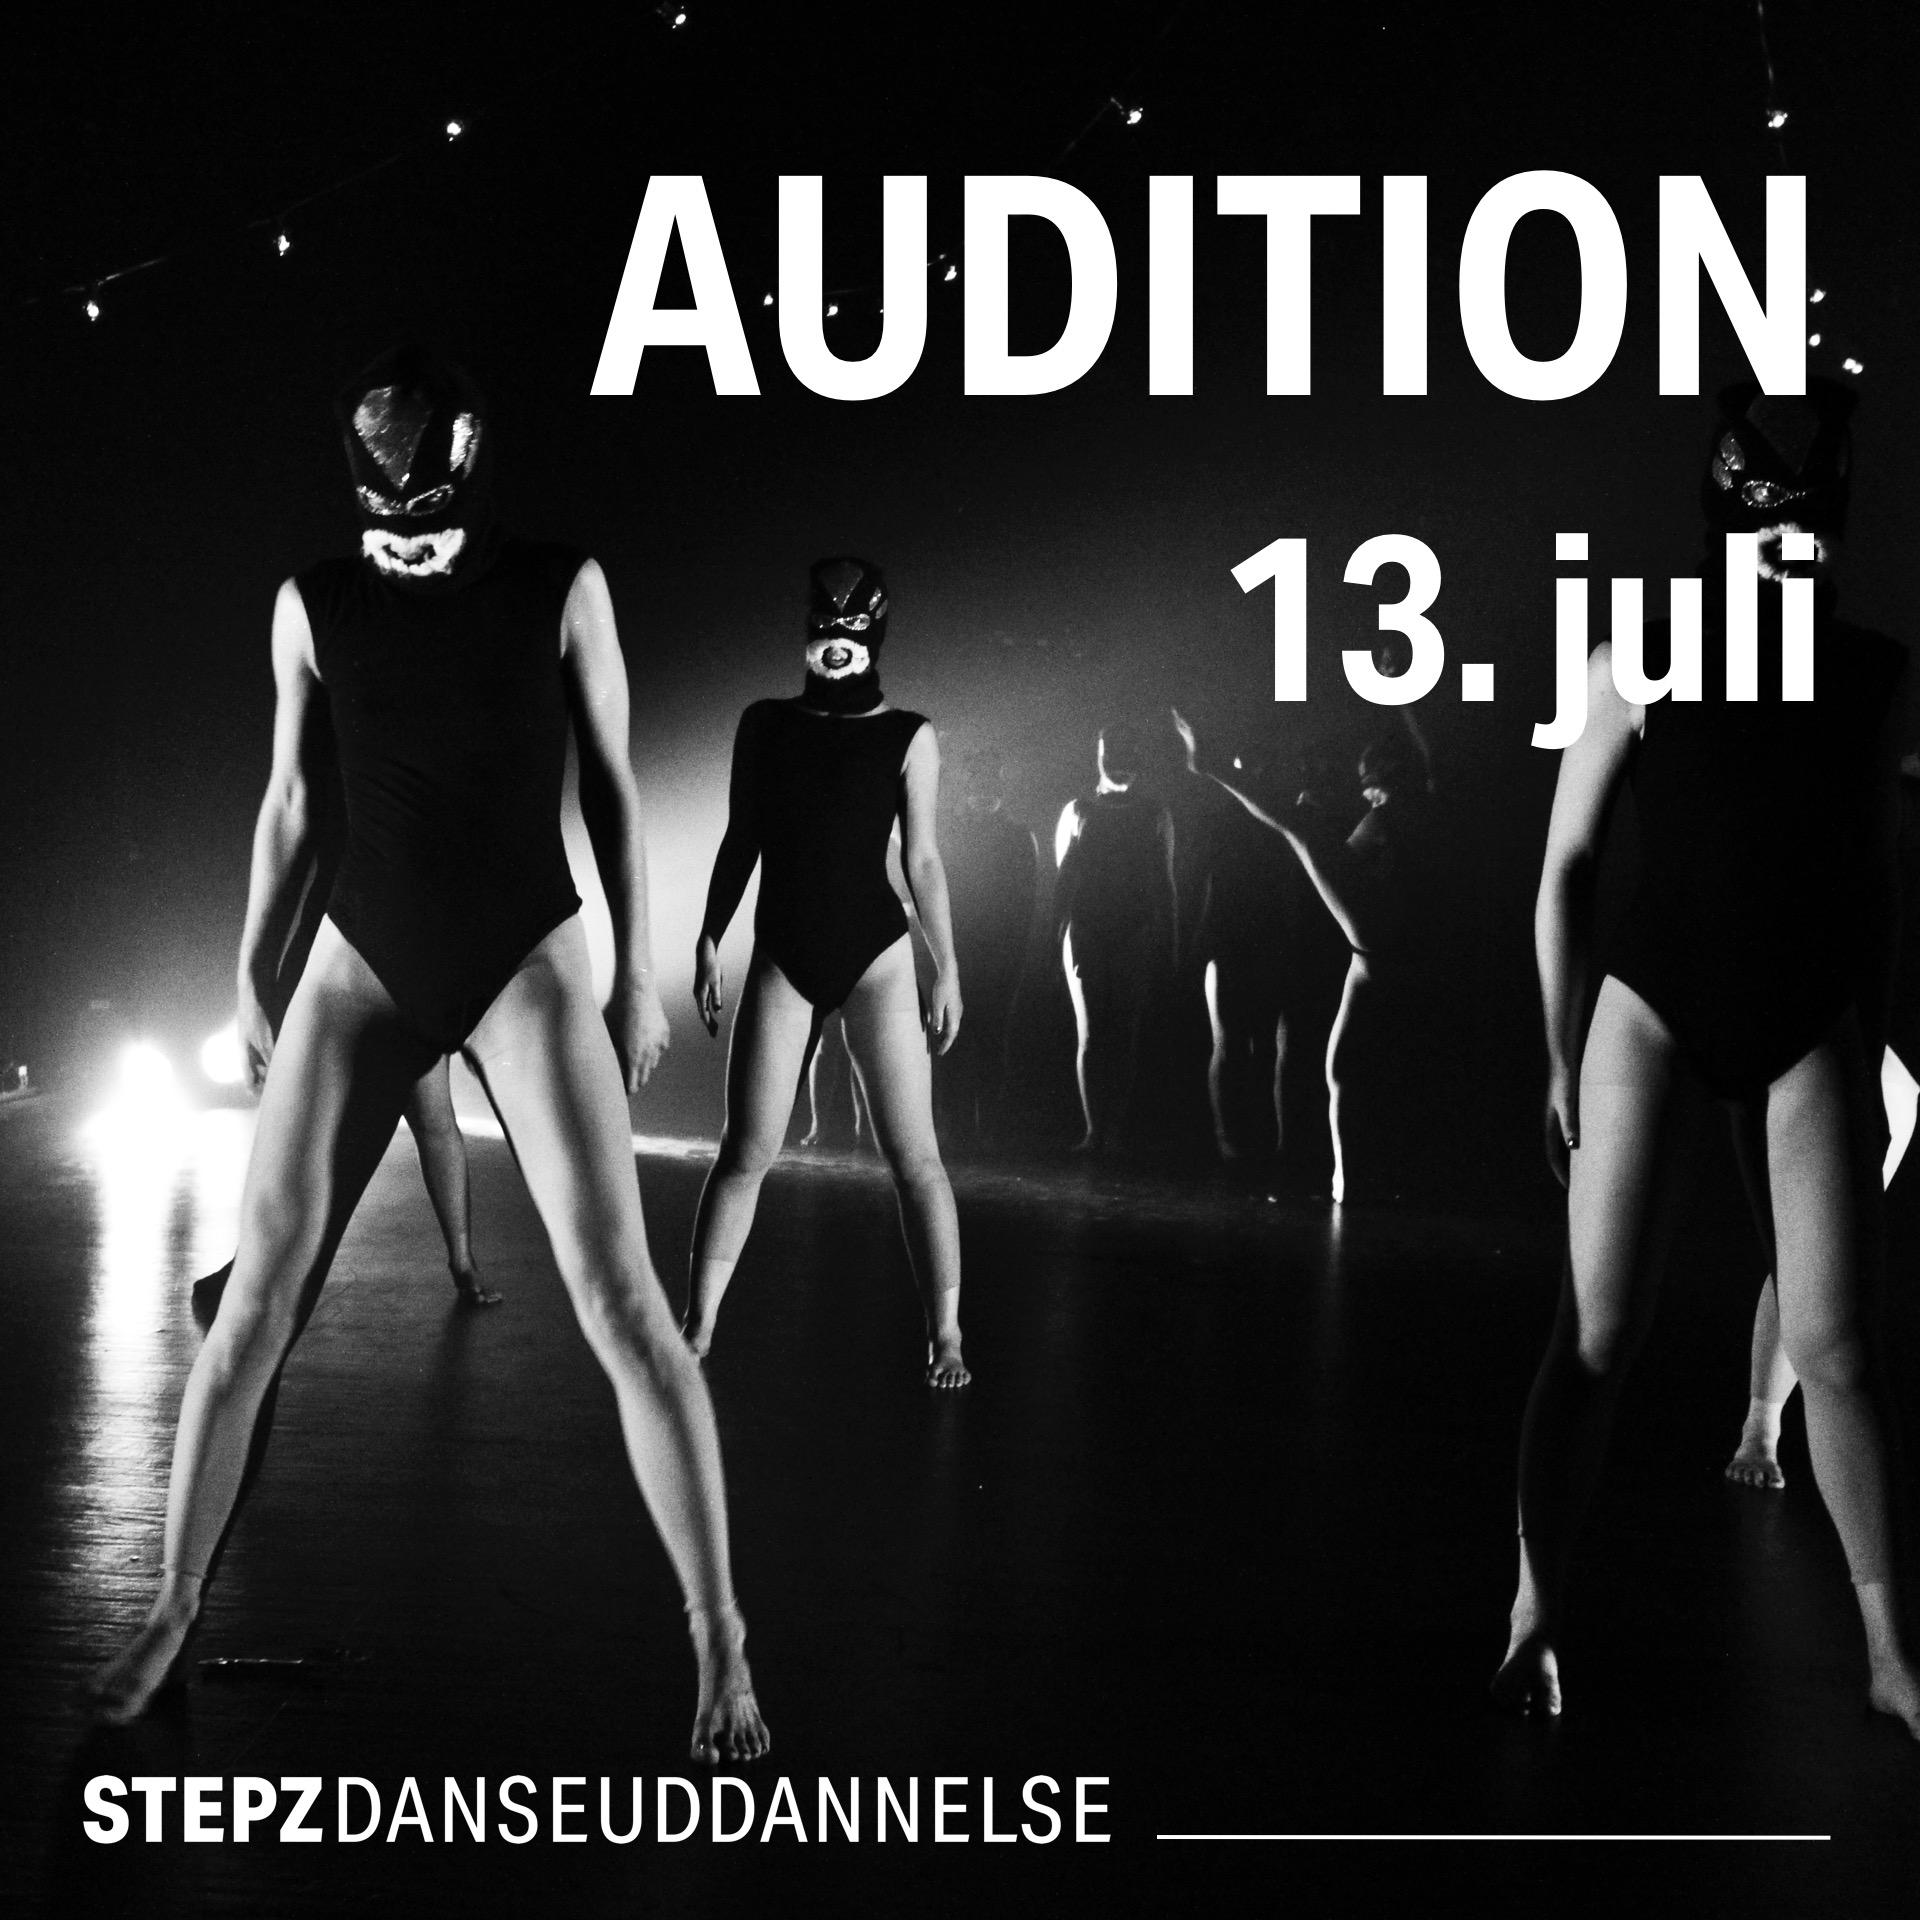 STEPZ Danseuddannelse audition